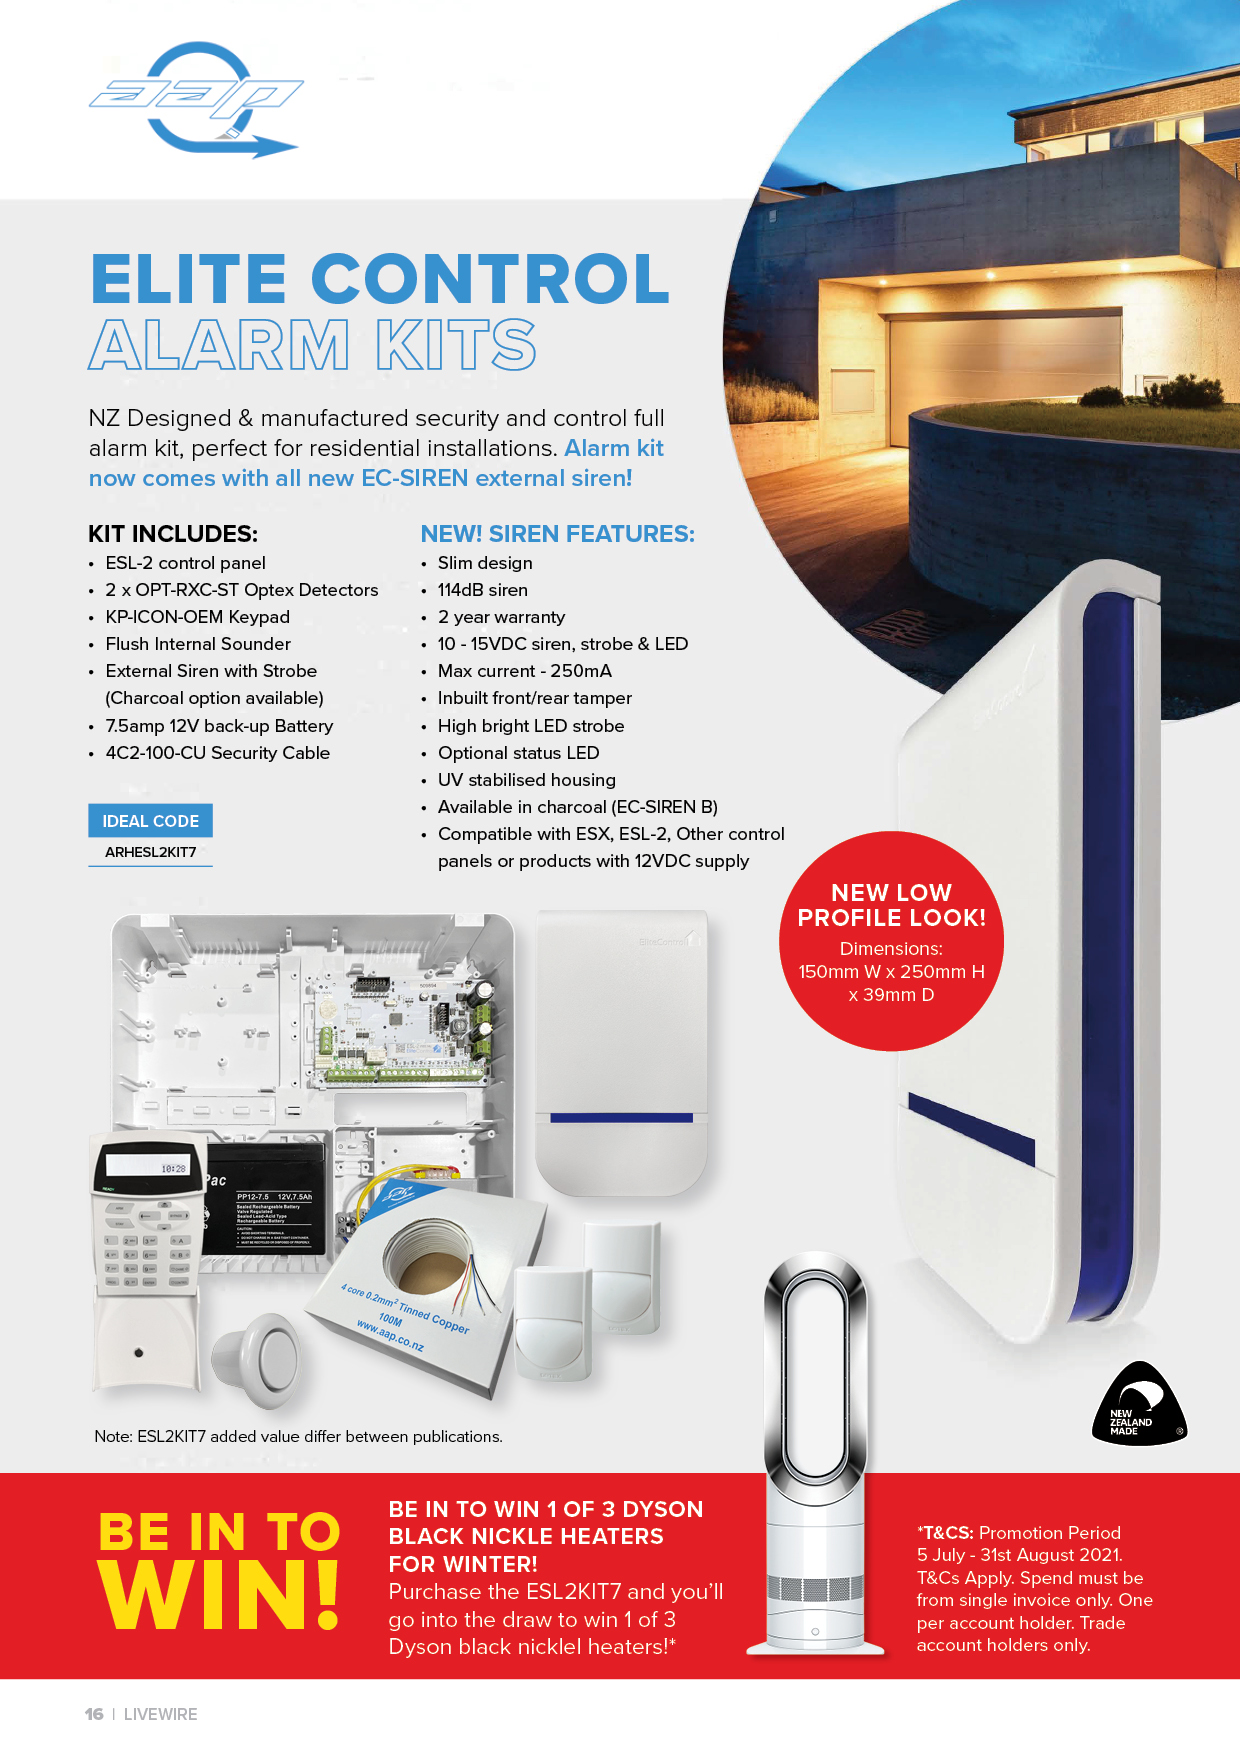 Elite Control Alarm Kit